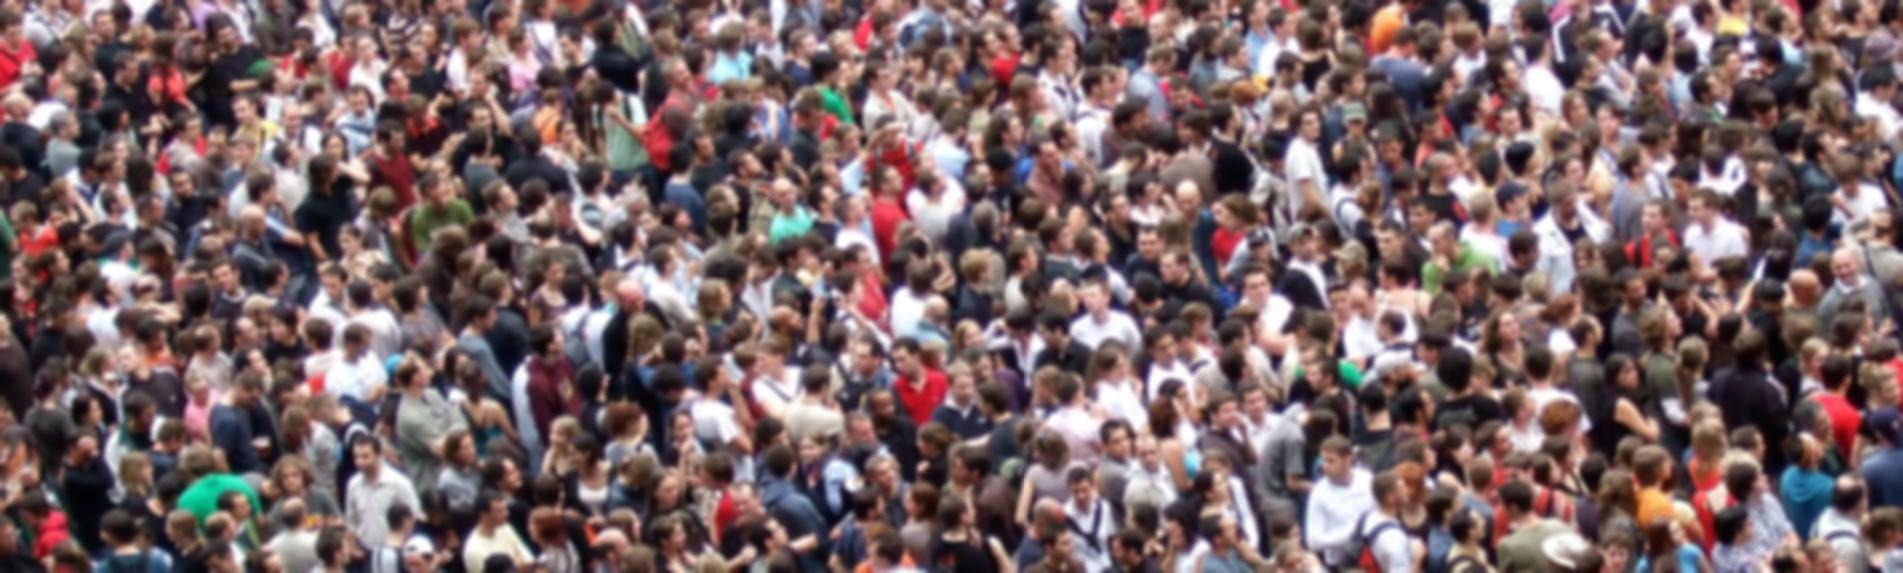 crowds-2768571_flou